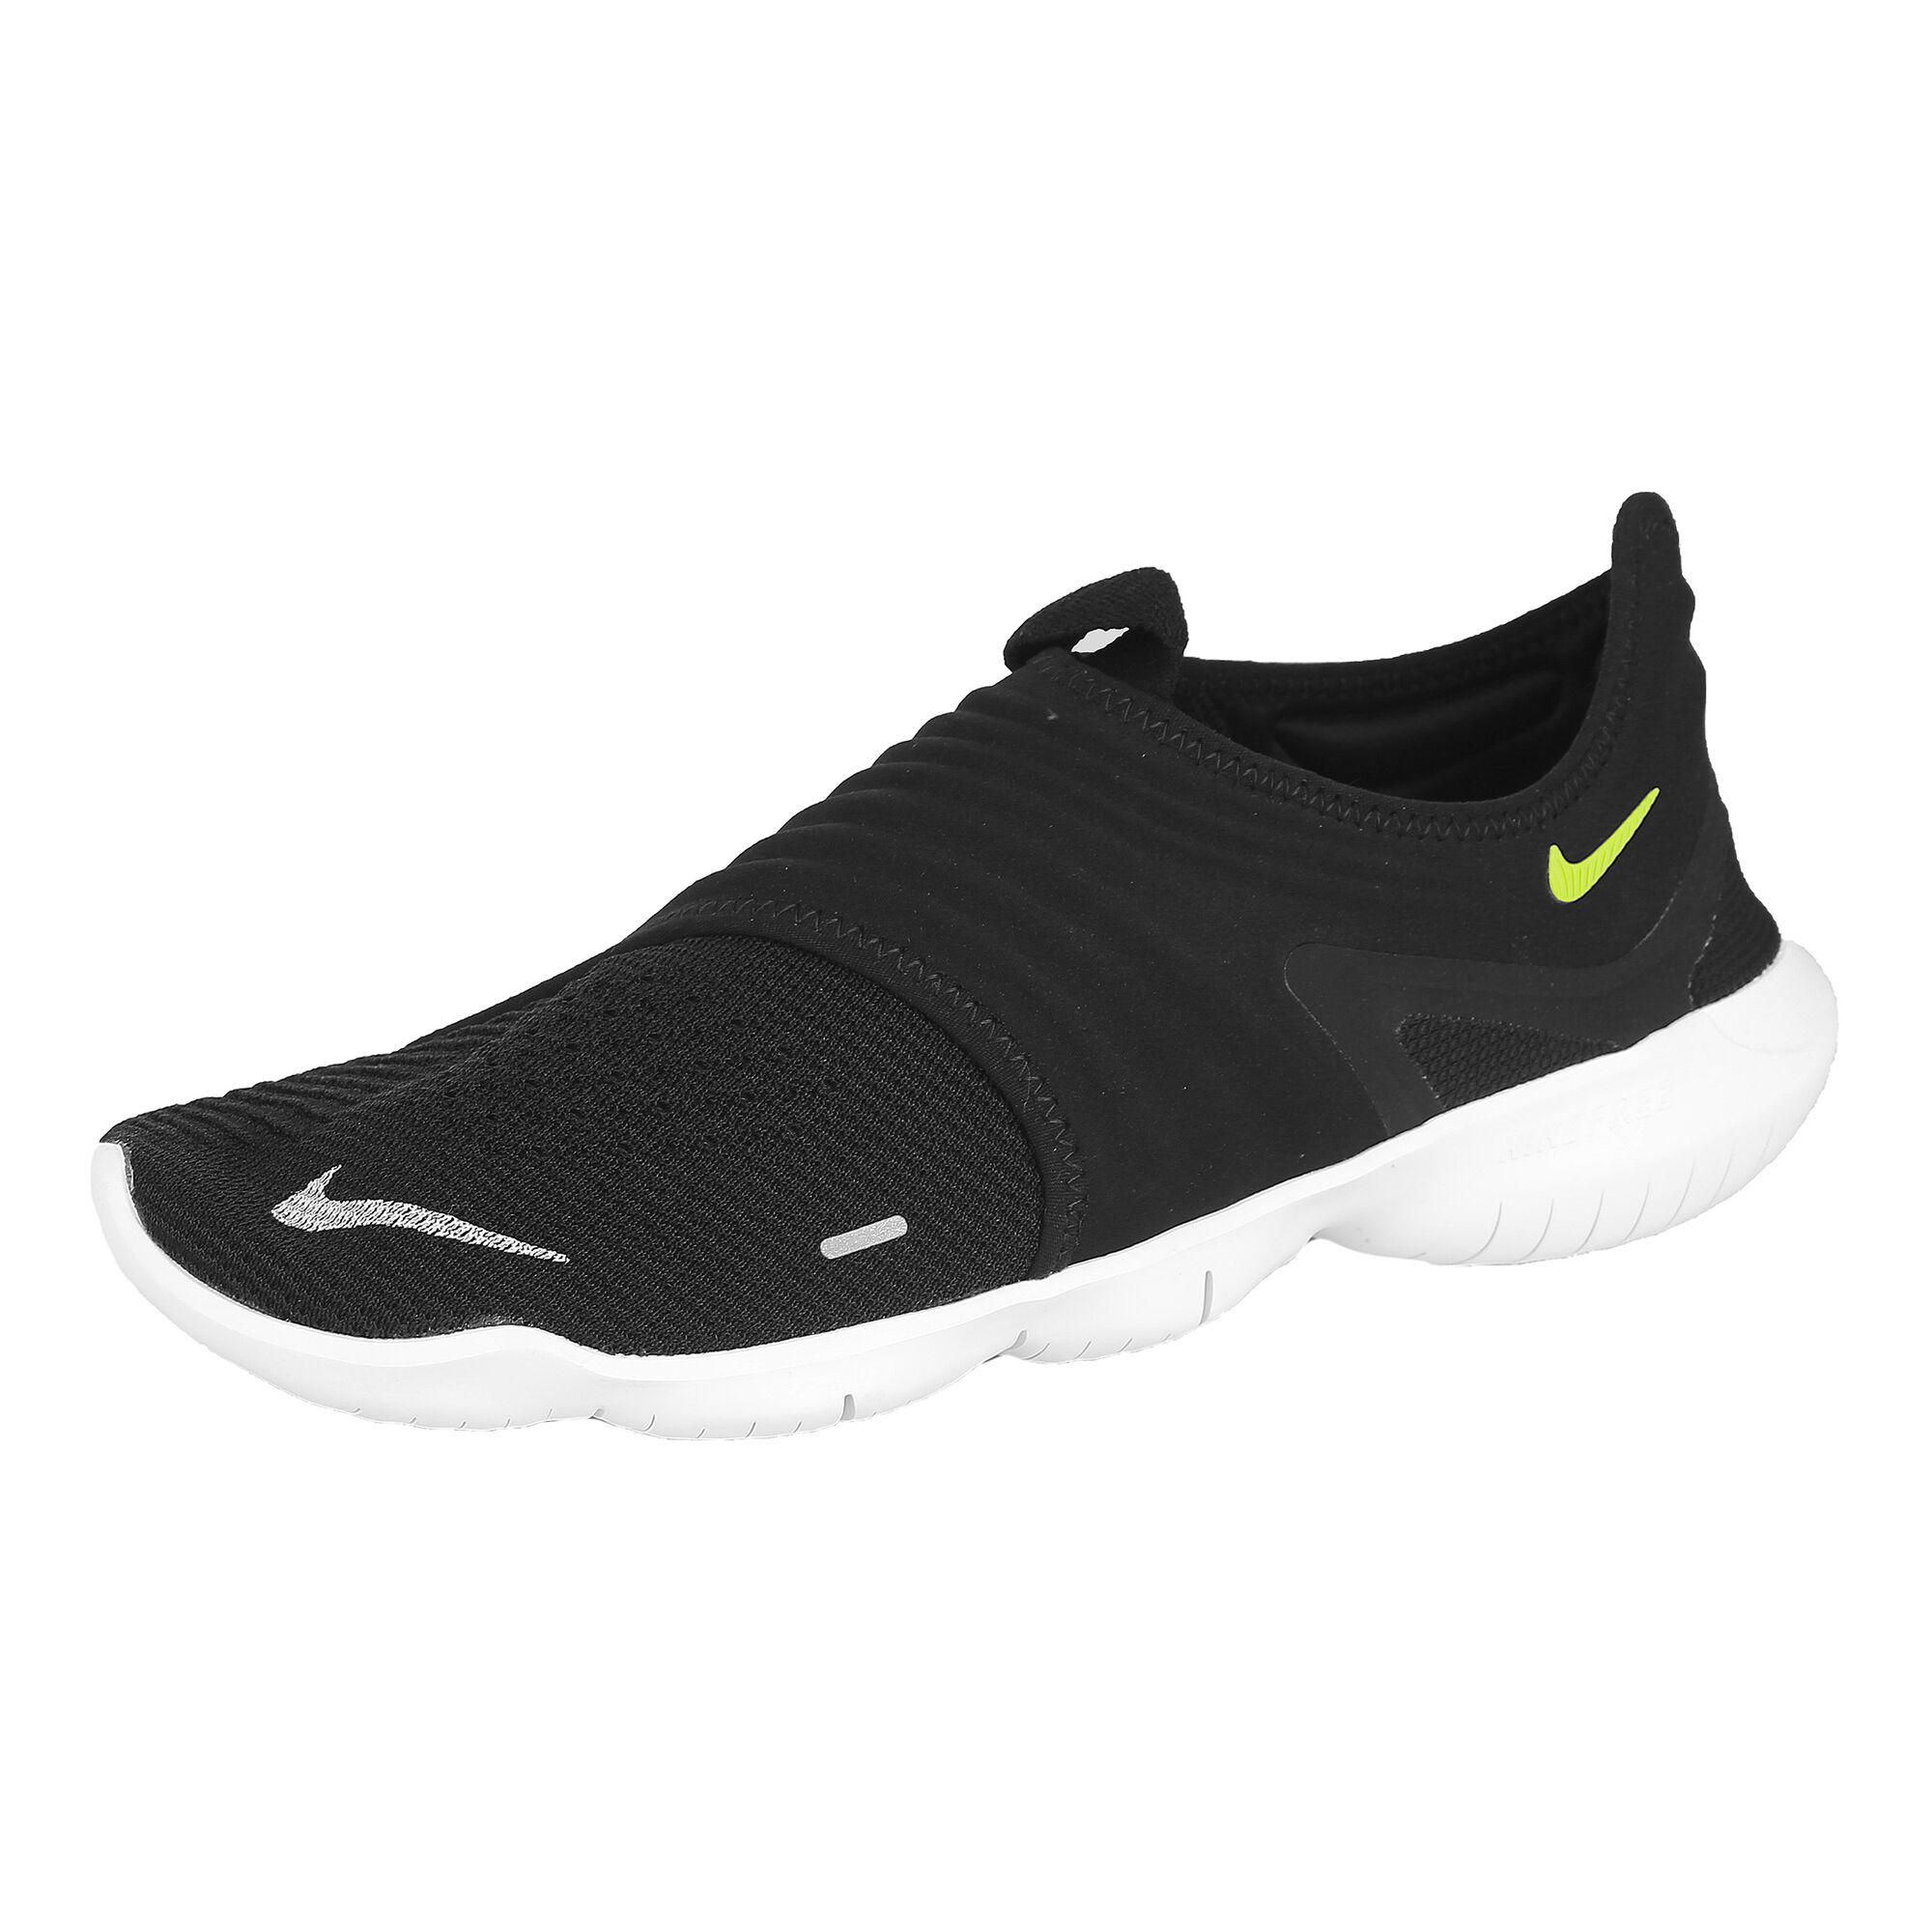 buy online d8159 676db Nike · Nike · Nike · Nike · Nike. Free Run Flyknit 3.0 ...